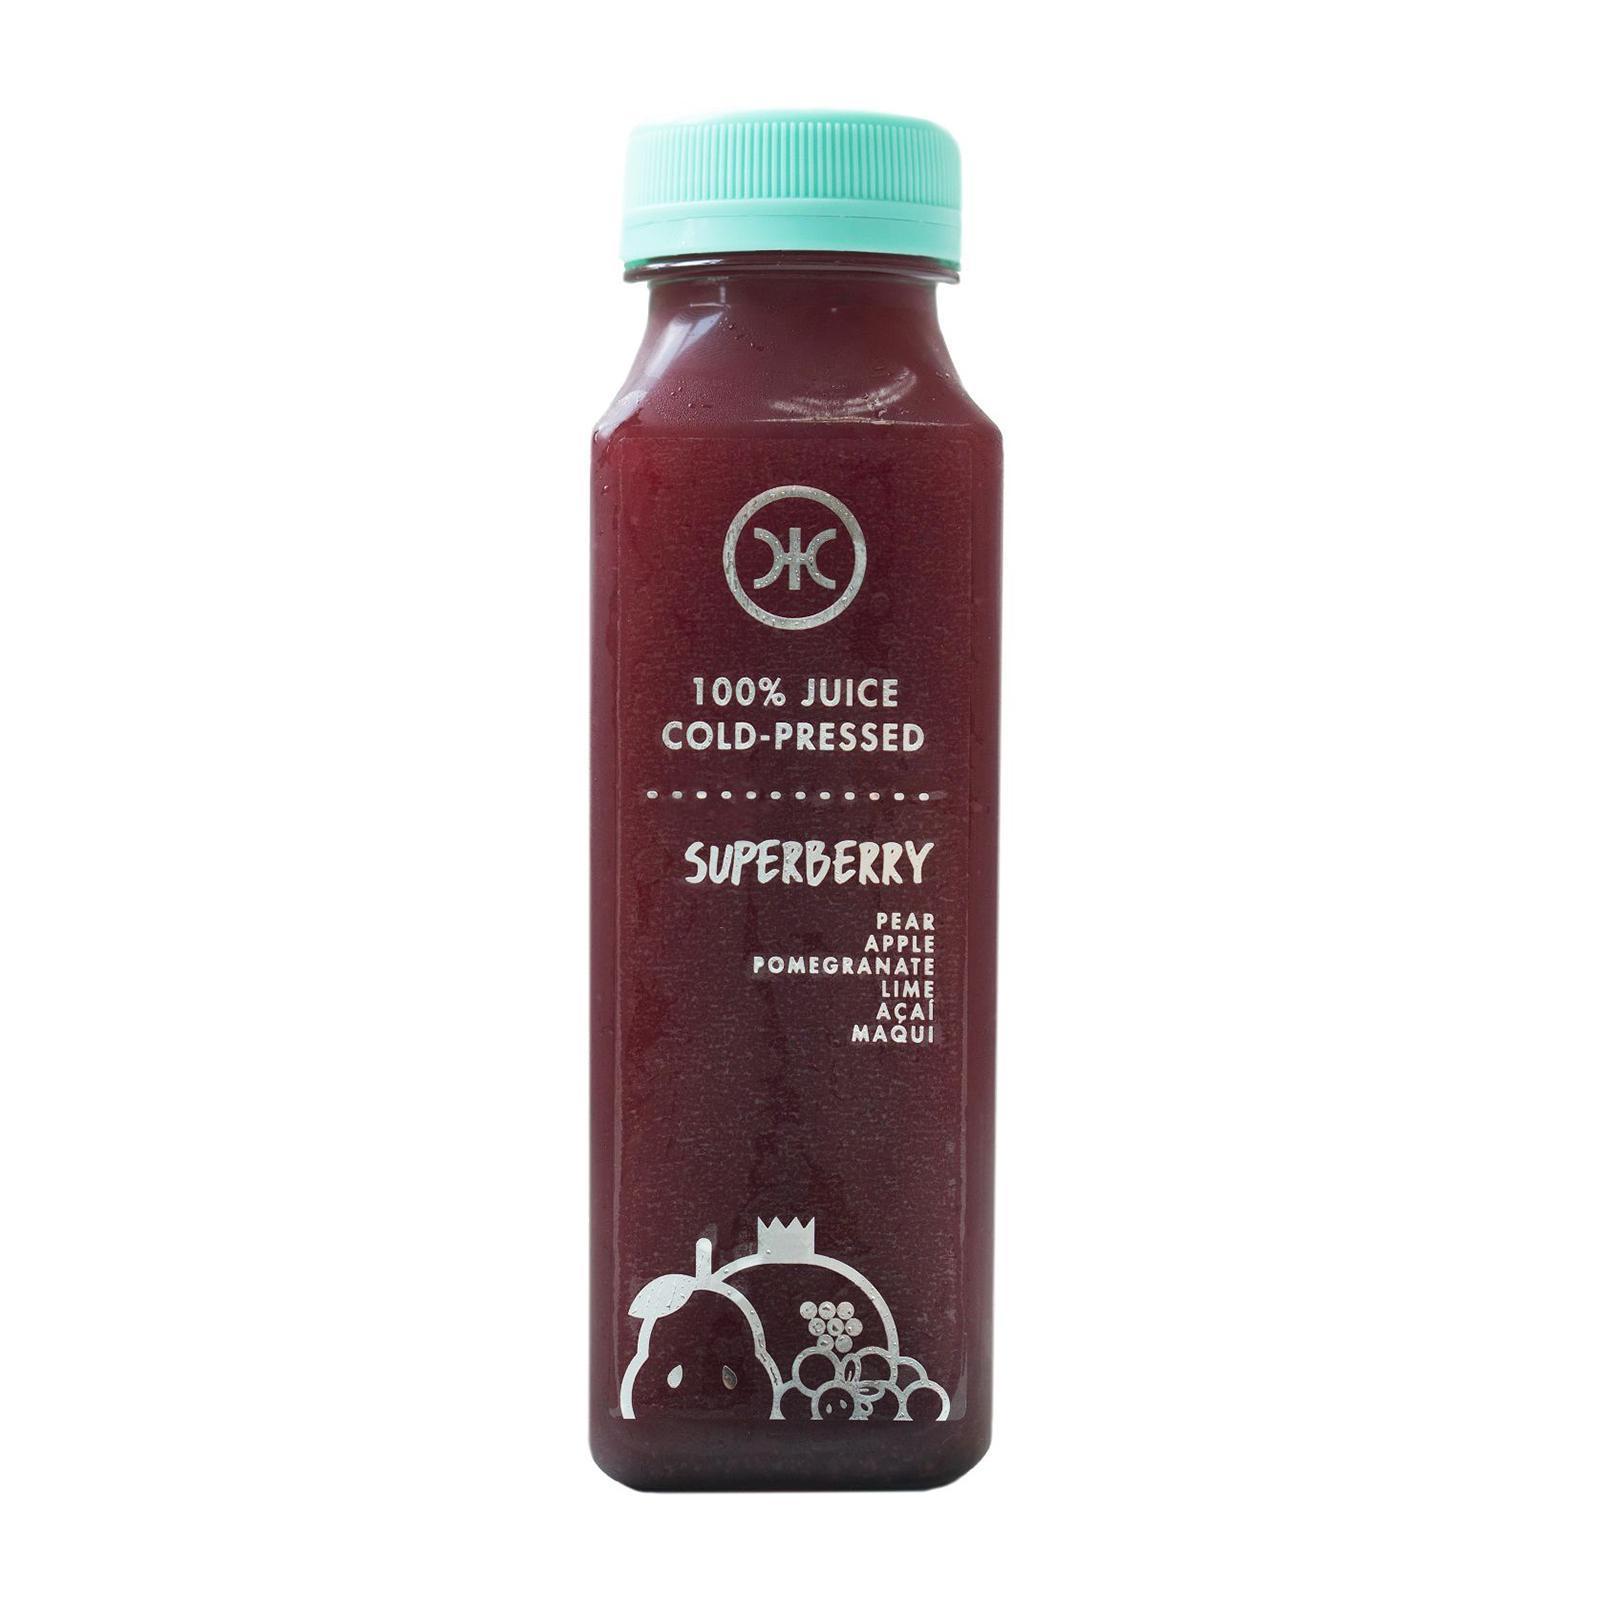 Hicjuice 100% Juice Cold Pressed Superberry By Redmart.